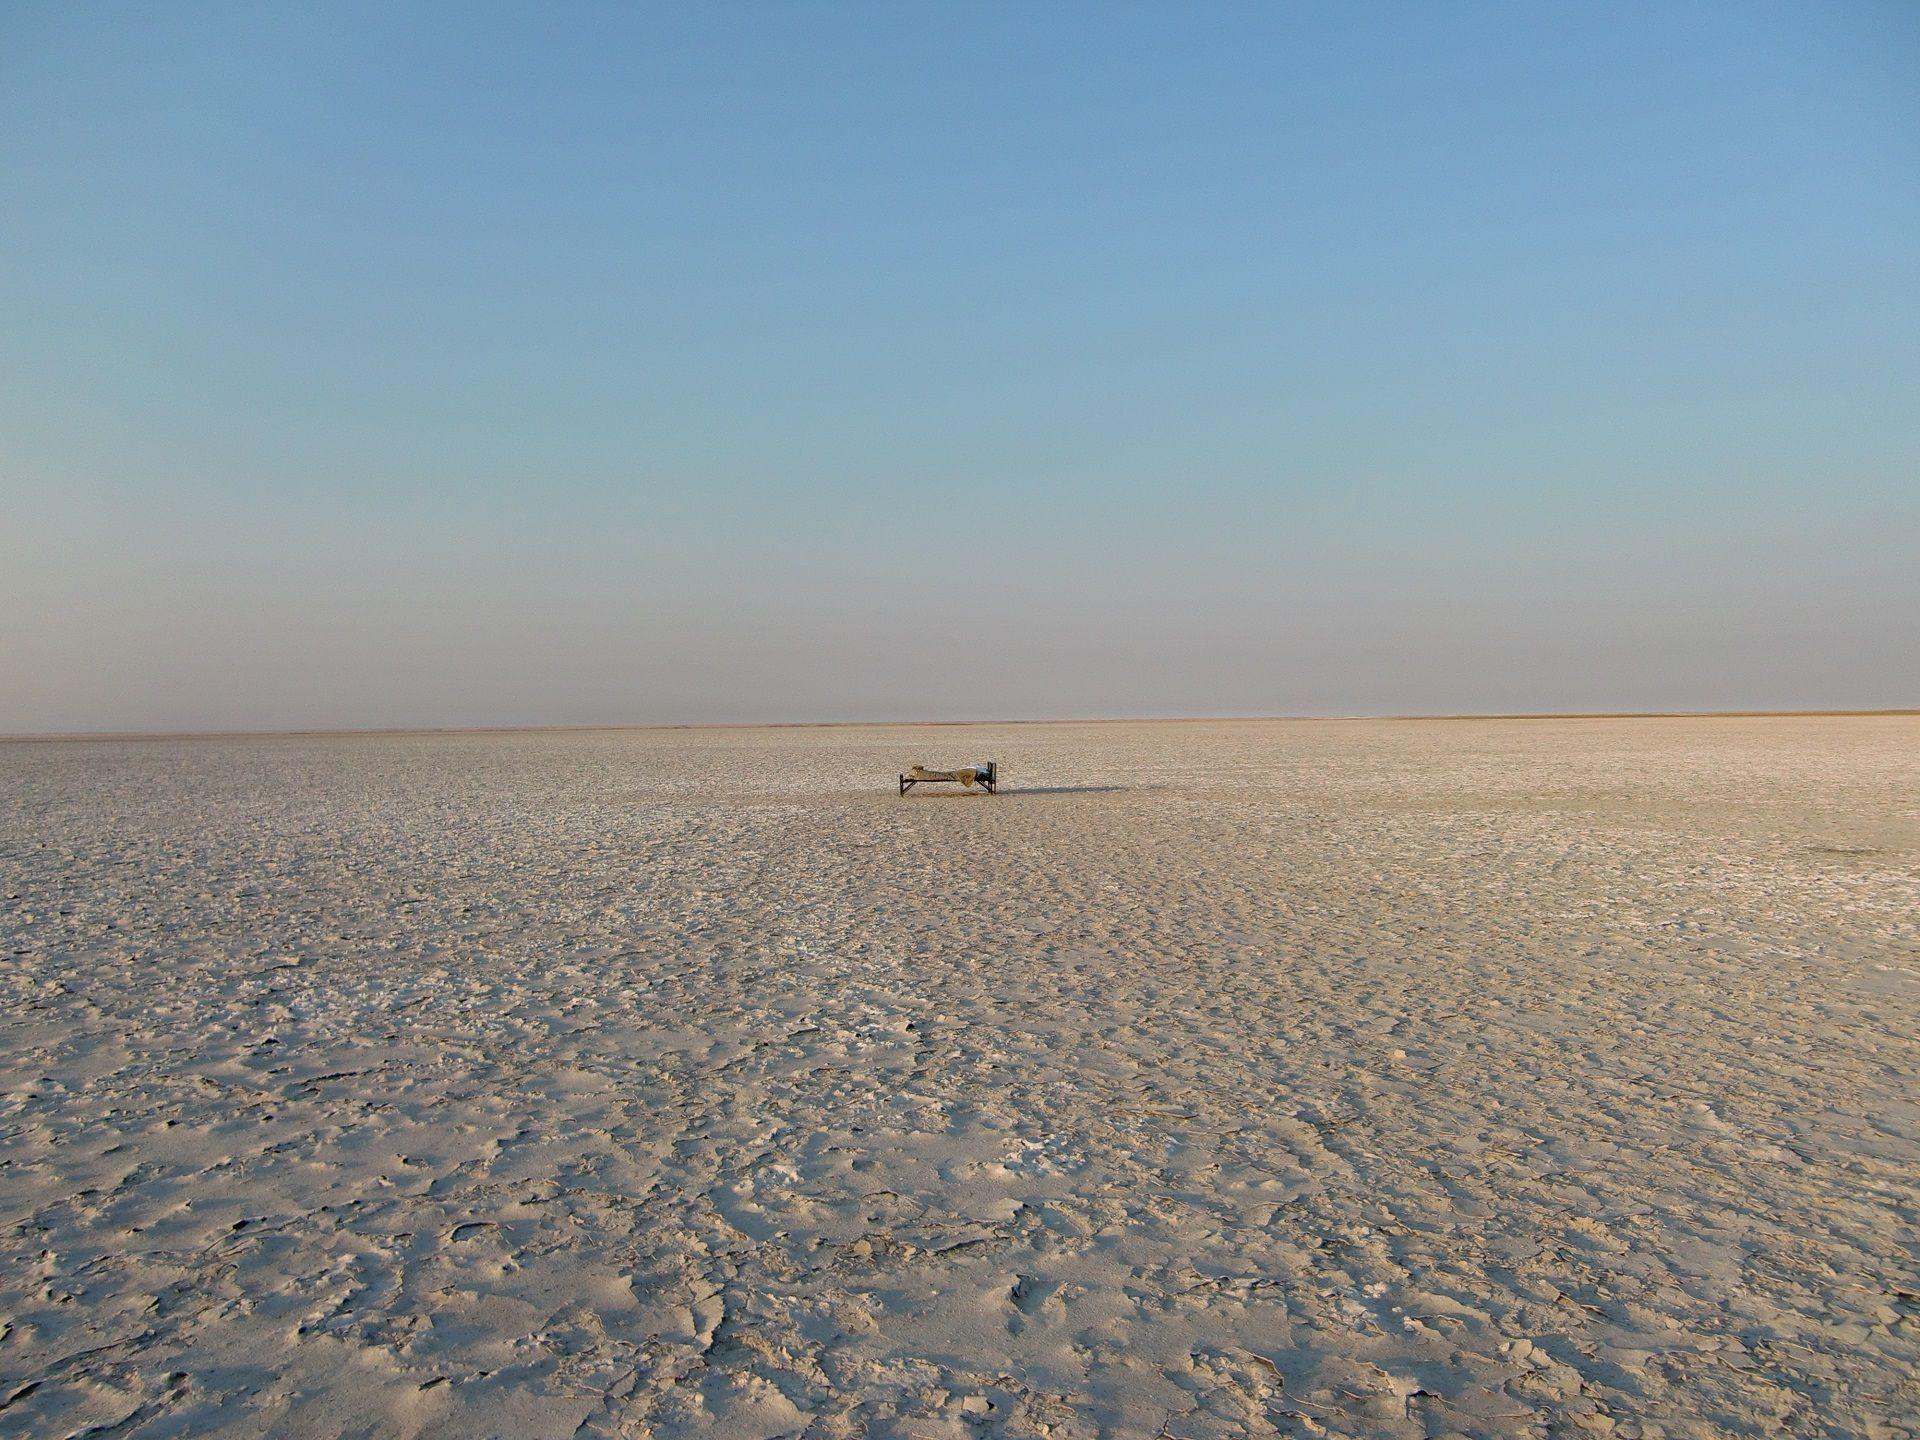 Makgadikgadi Pans - Central Kalahari, Nxai & Makgadikgadi Pans Botswana